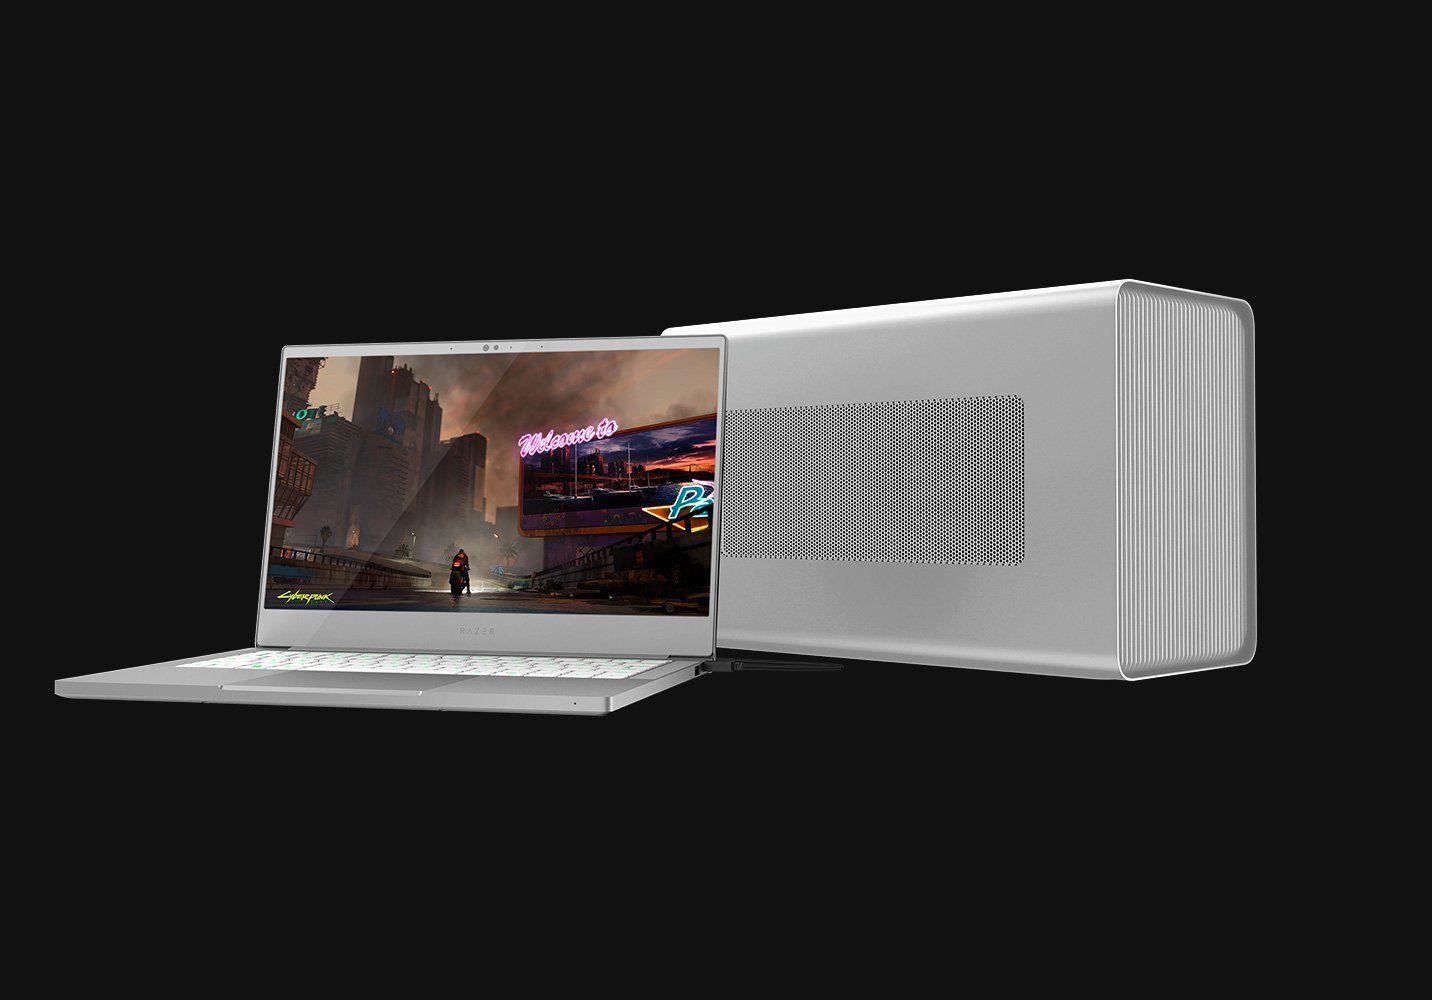 Razer Core X EGPU enclosure attached to a laptop